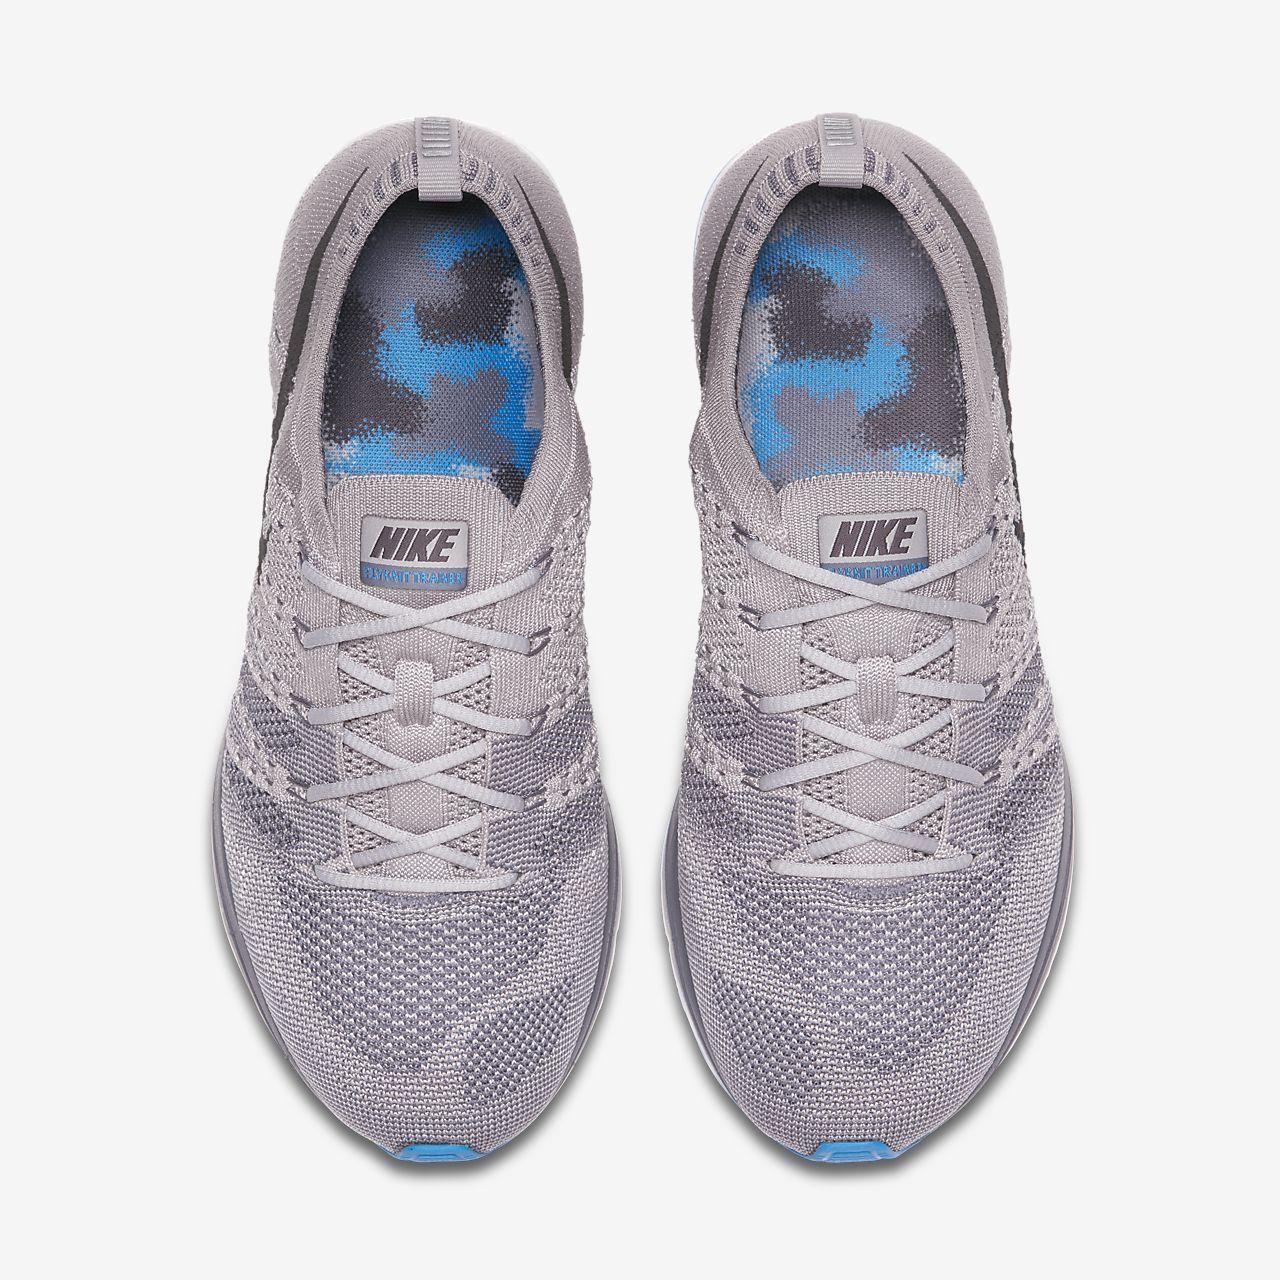 20e40e9fe088 Nike Flyknit Trainer Unisex Shoe. Nike.com AU